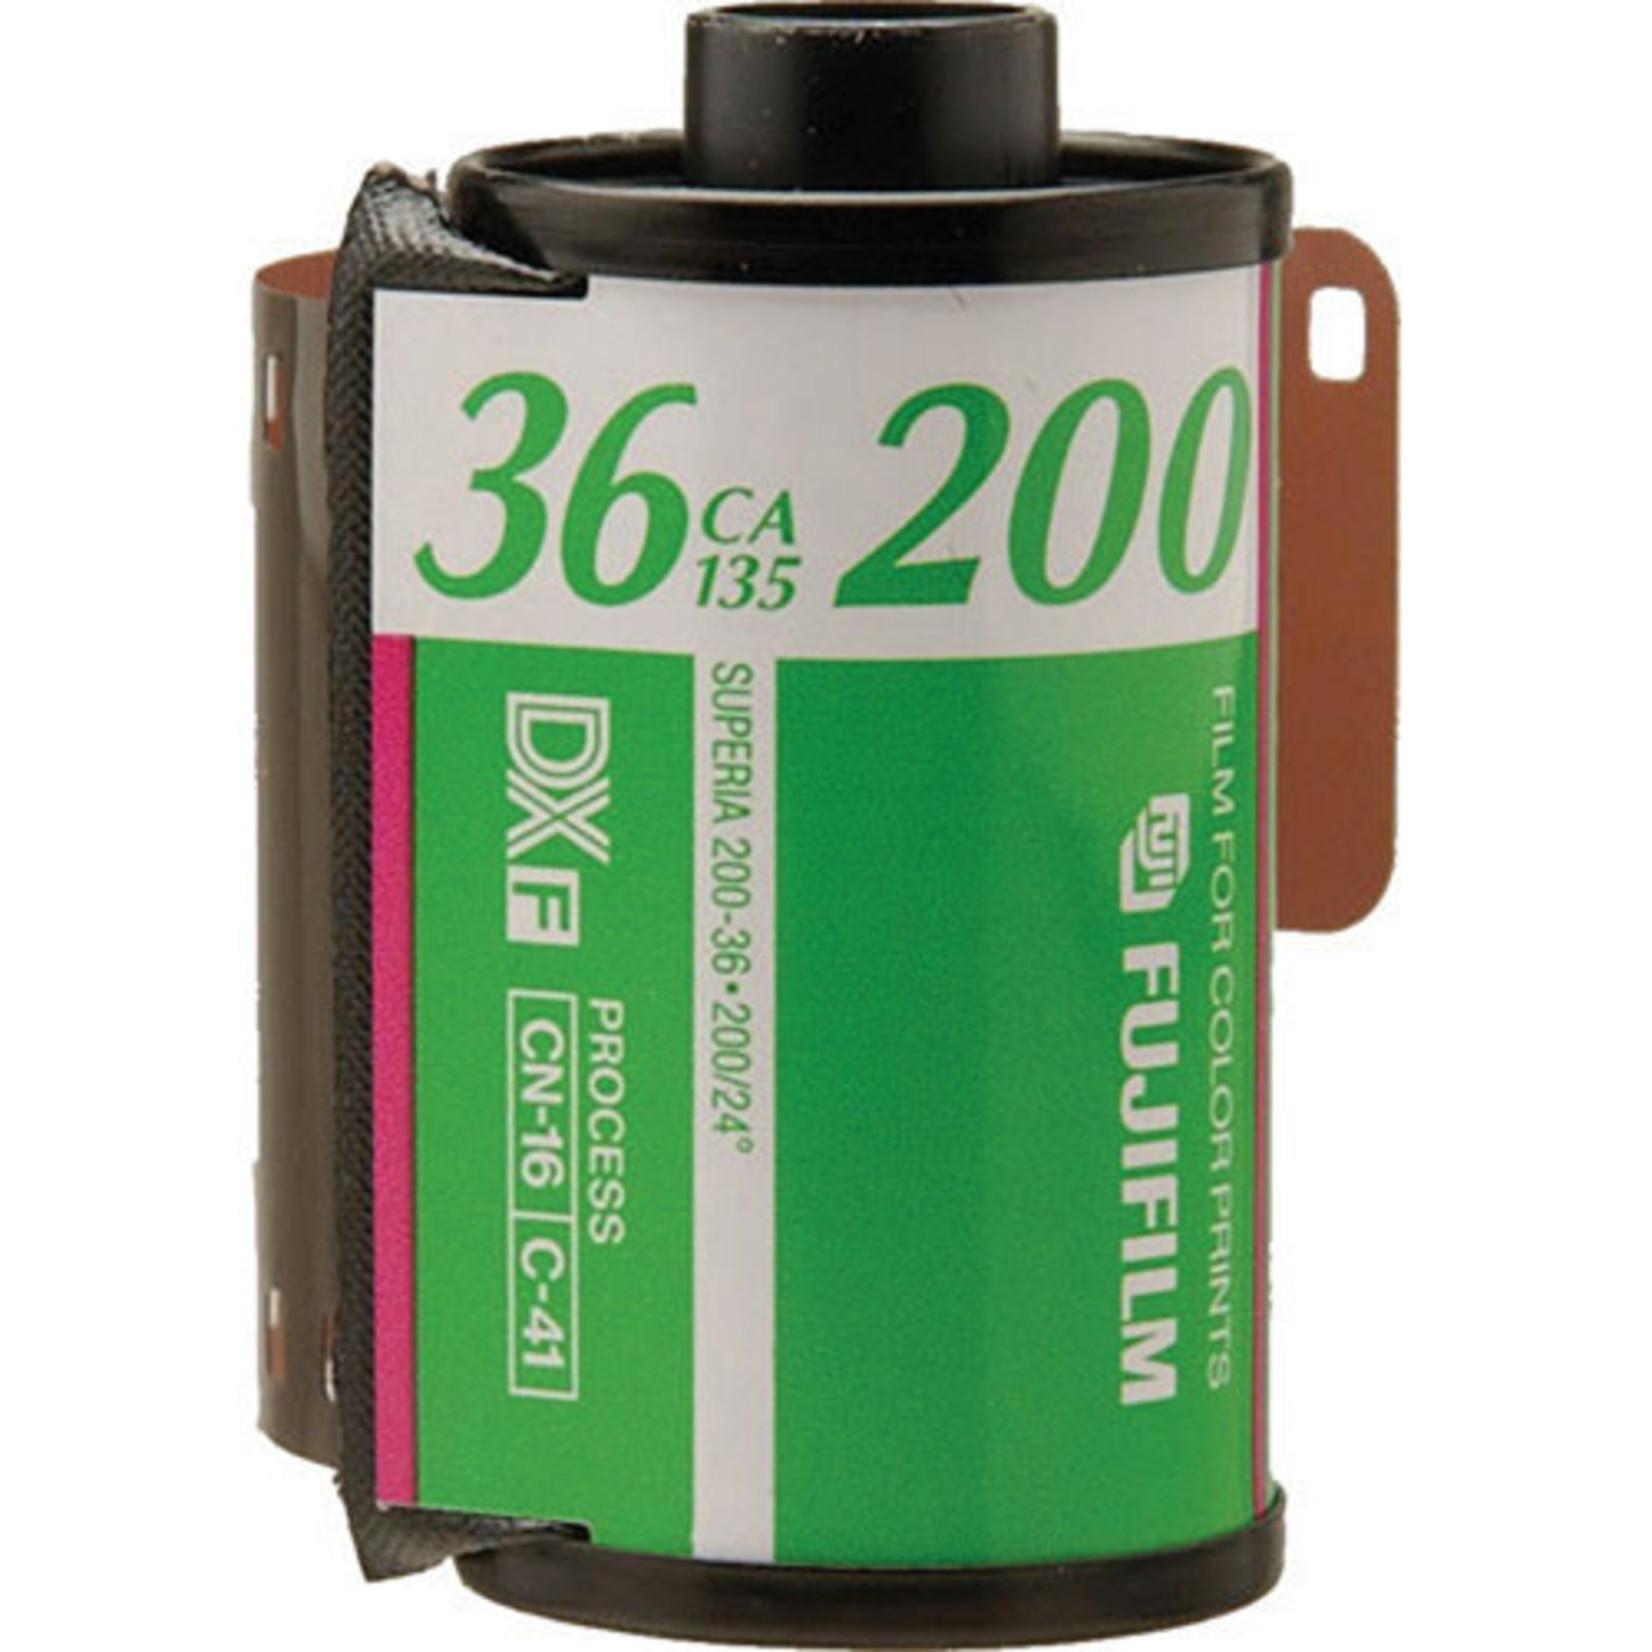 FujiFilm FujiFilm 200-36 Boxed Color Print Film